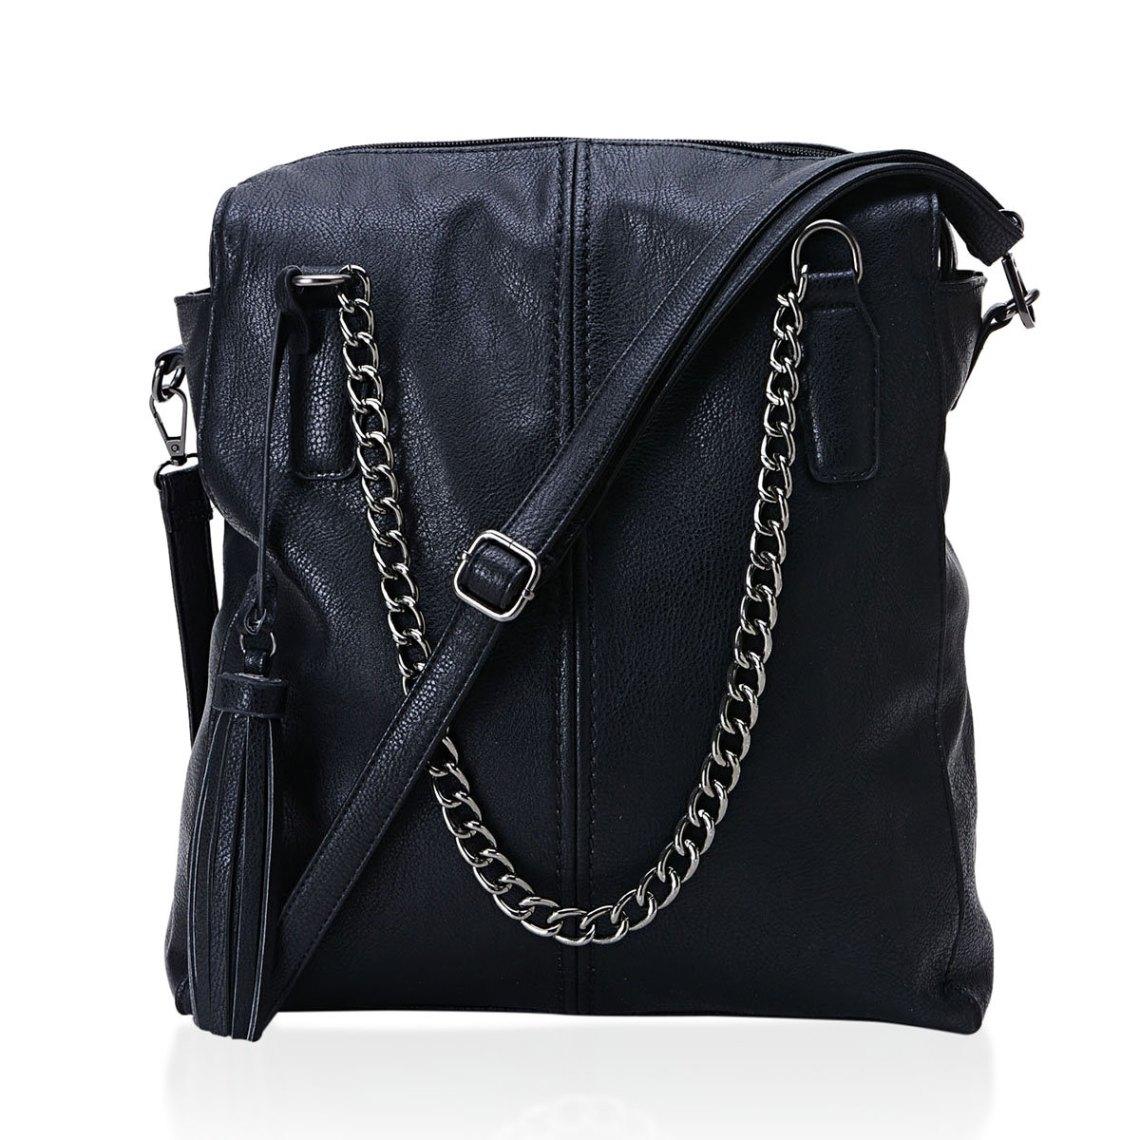 J Francis - Black Faux Leather Shoulder Bag